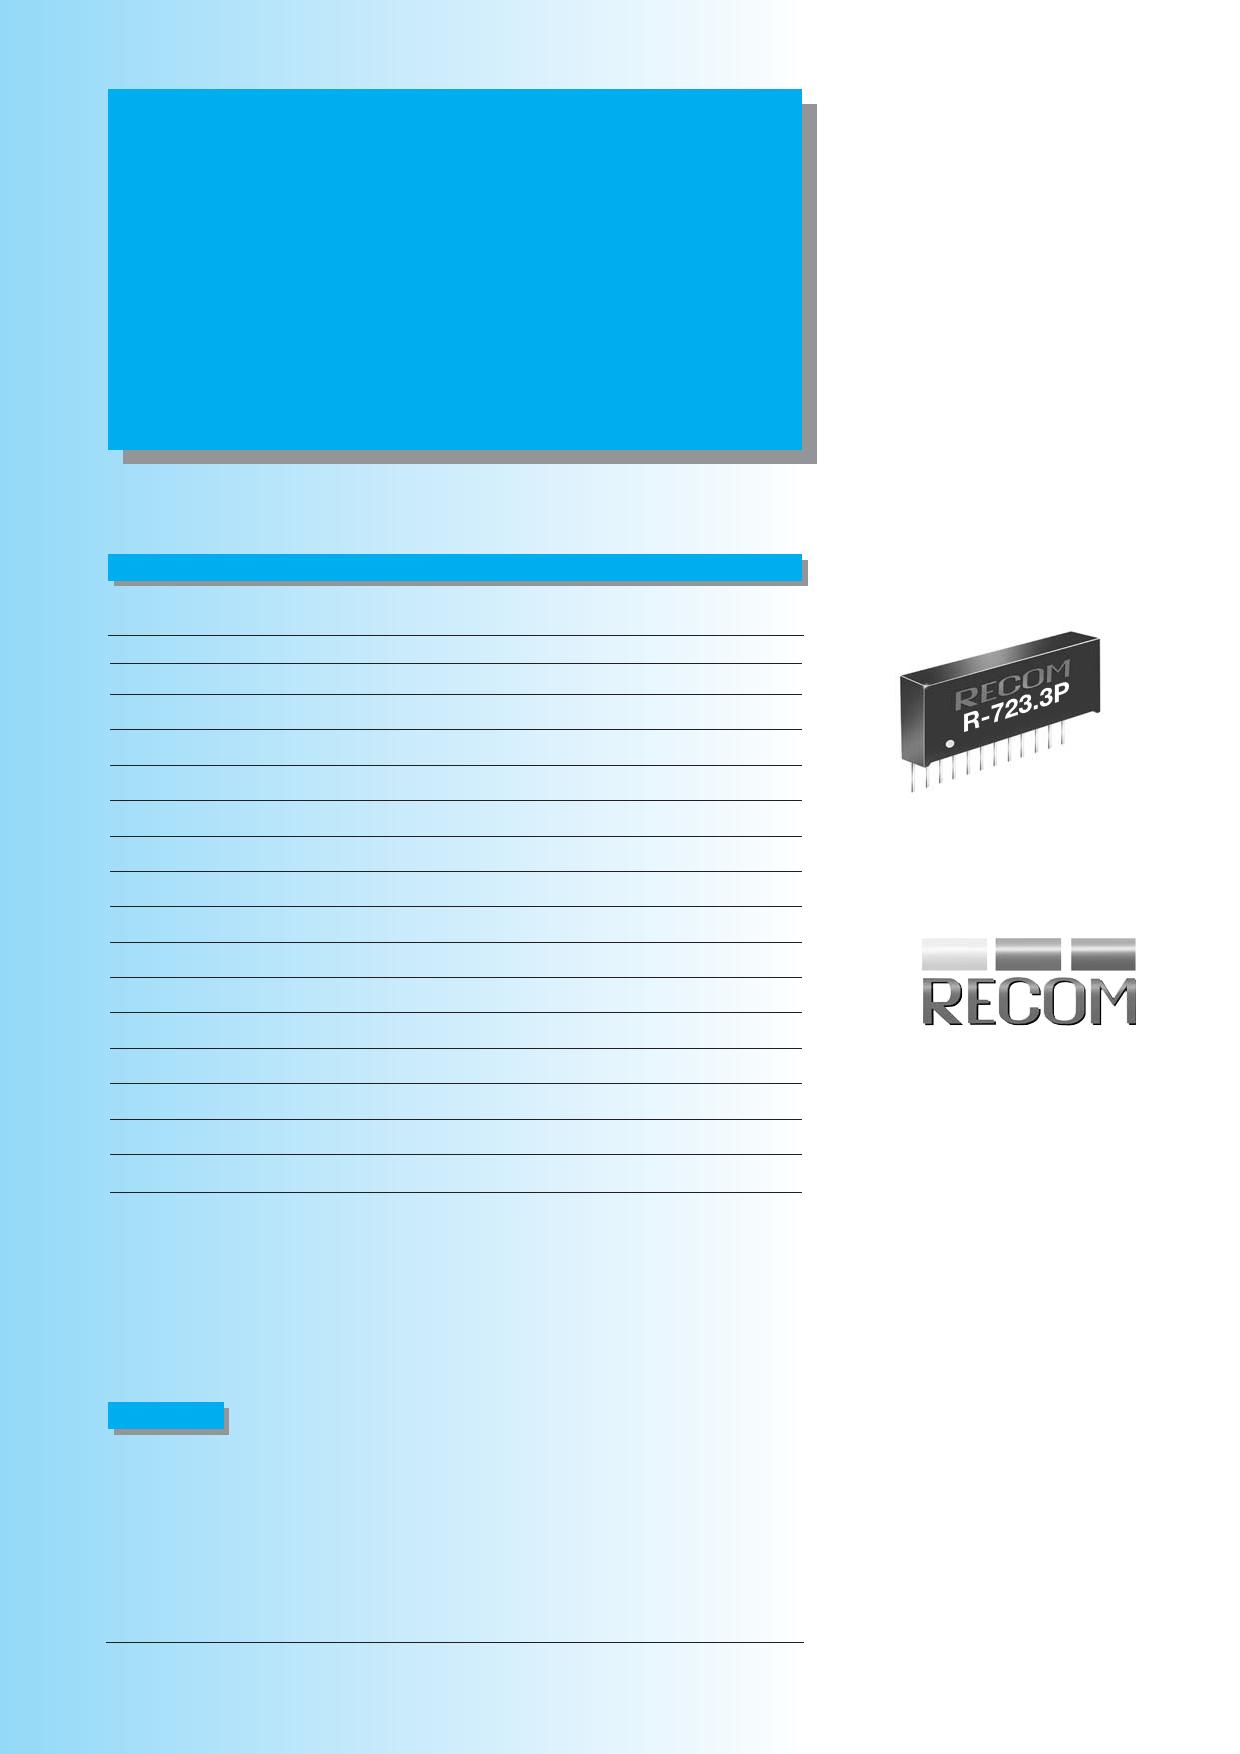 R-723.3P دیتاشیت PDF